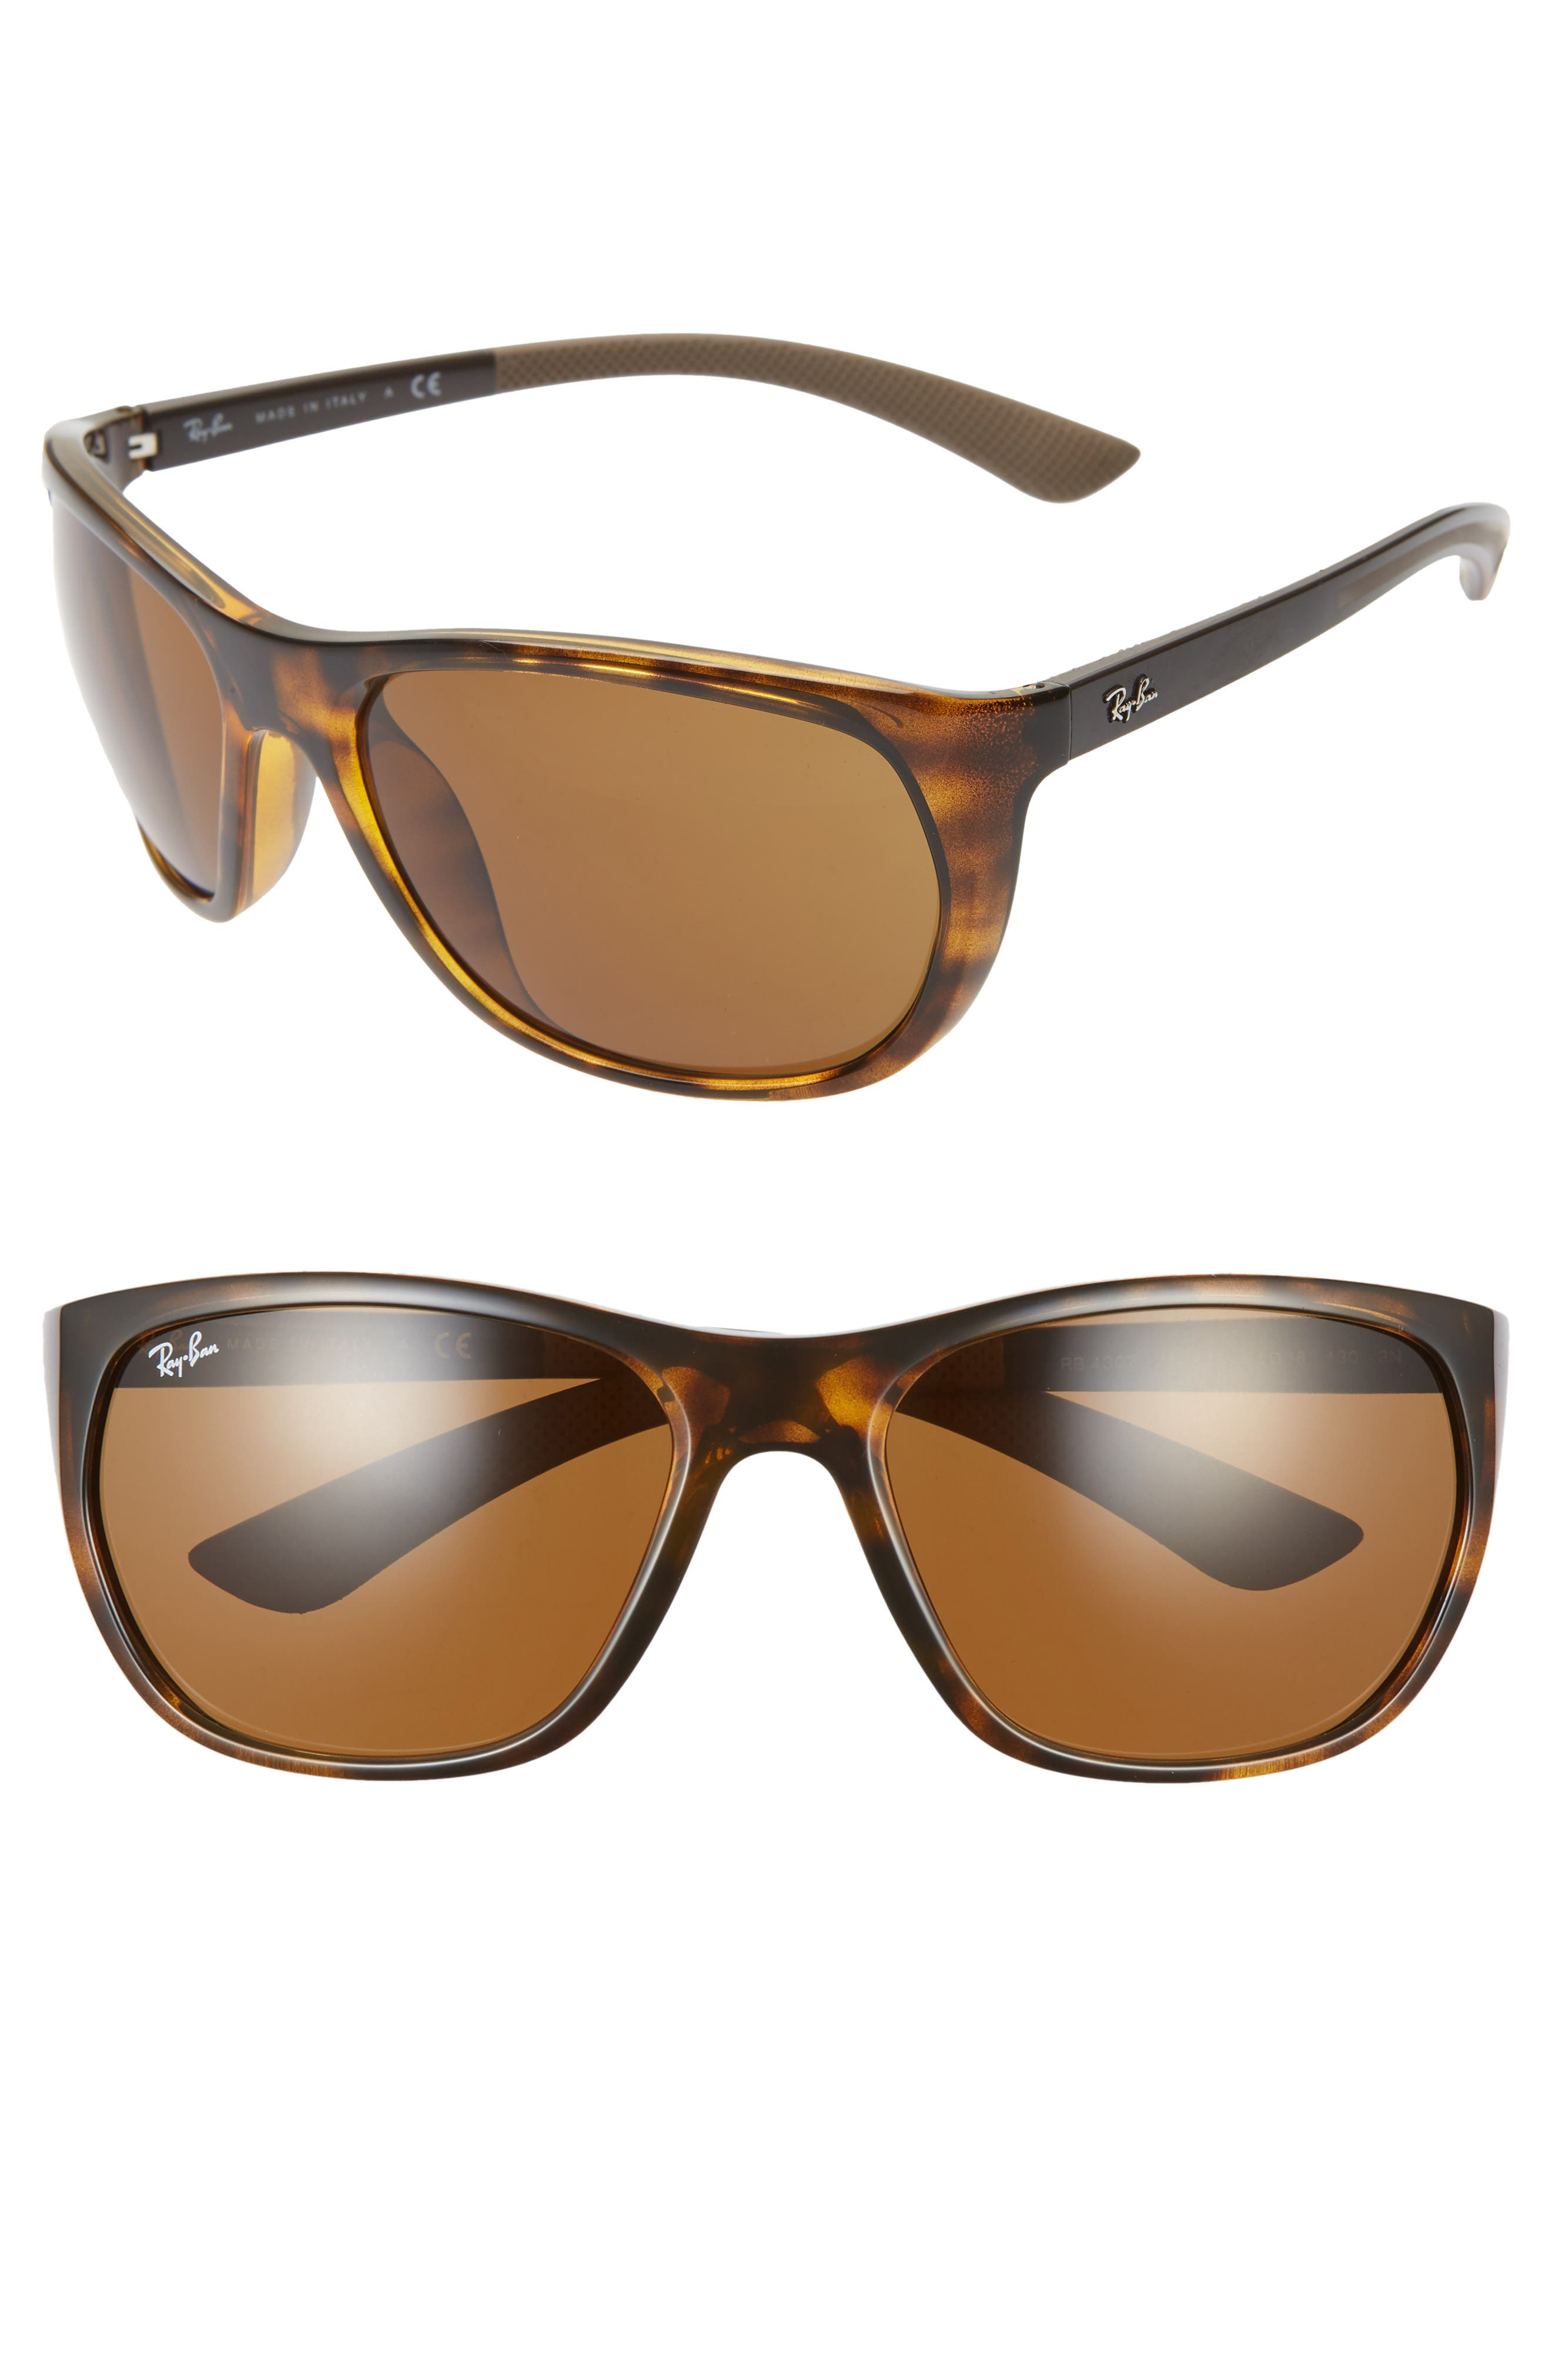 Ray-Ban 61Mm Wrap Sunglasses - Havana